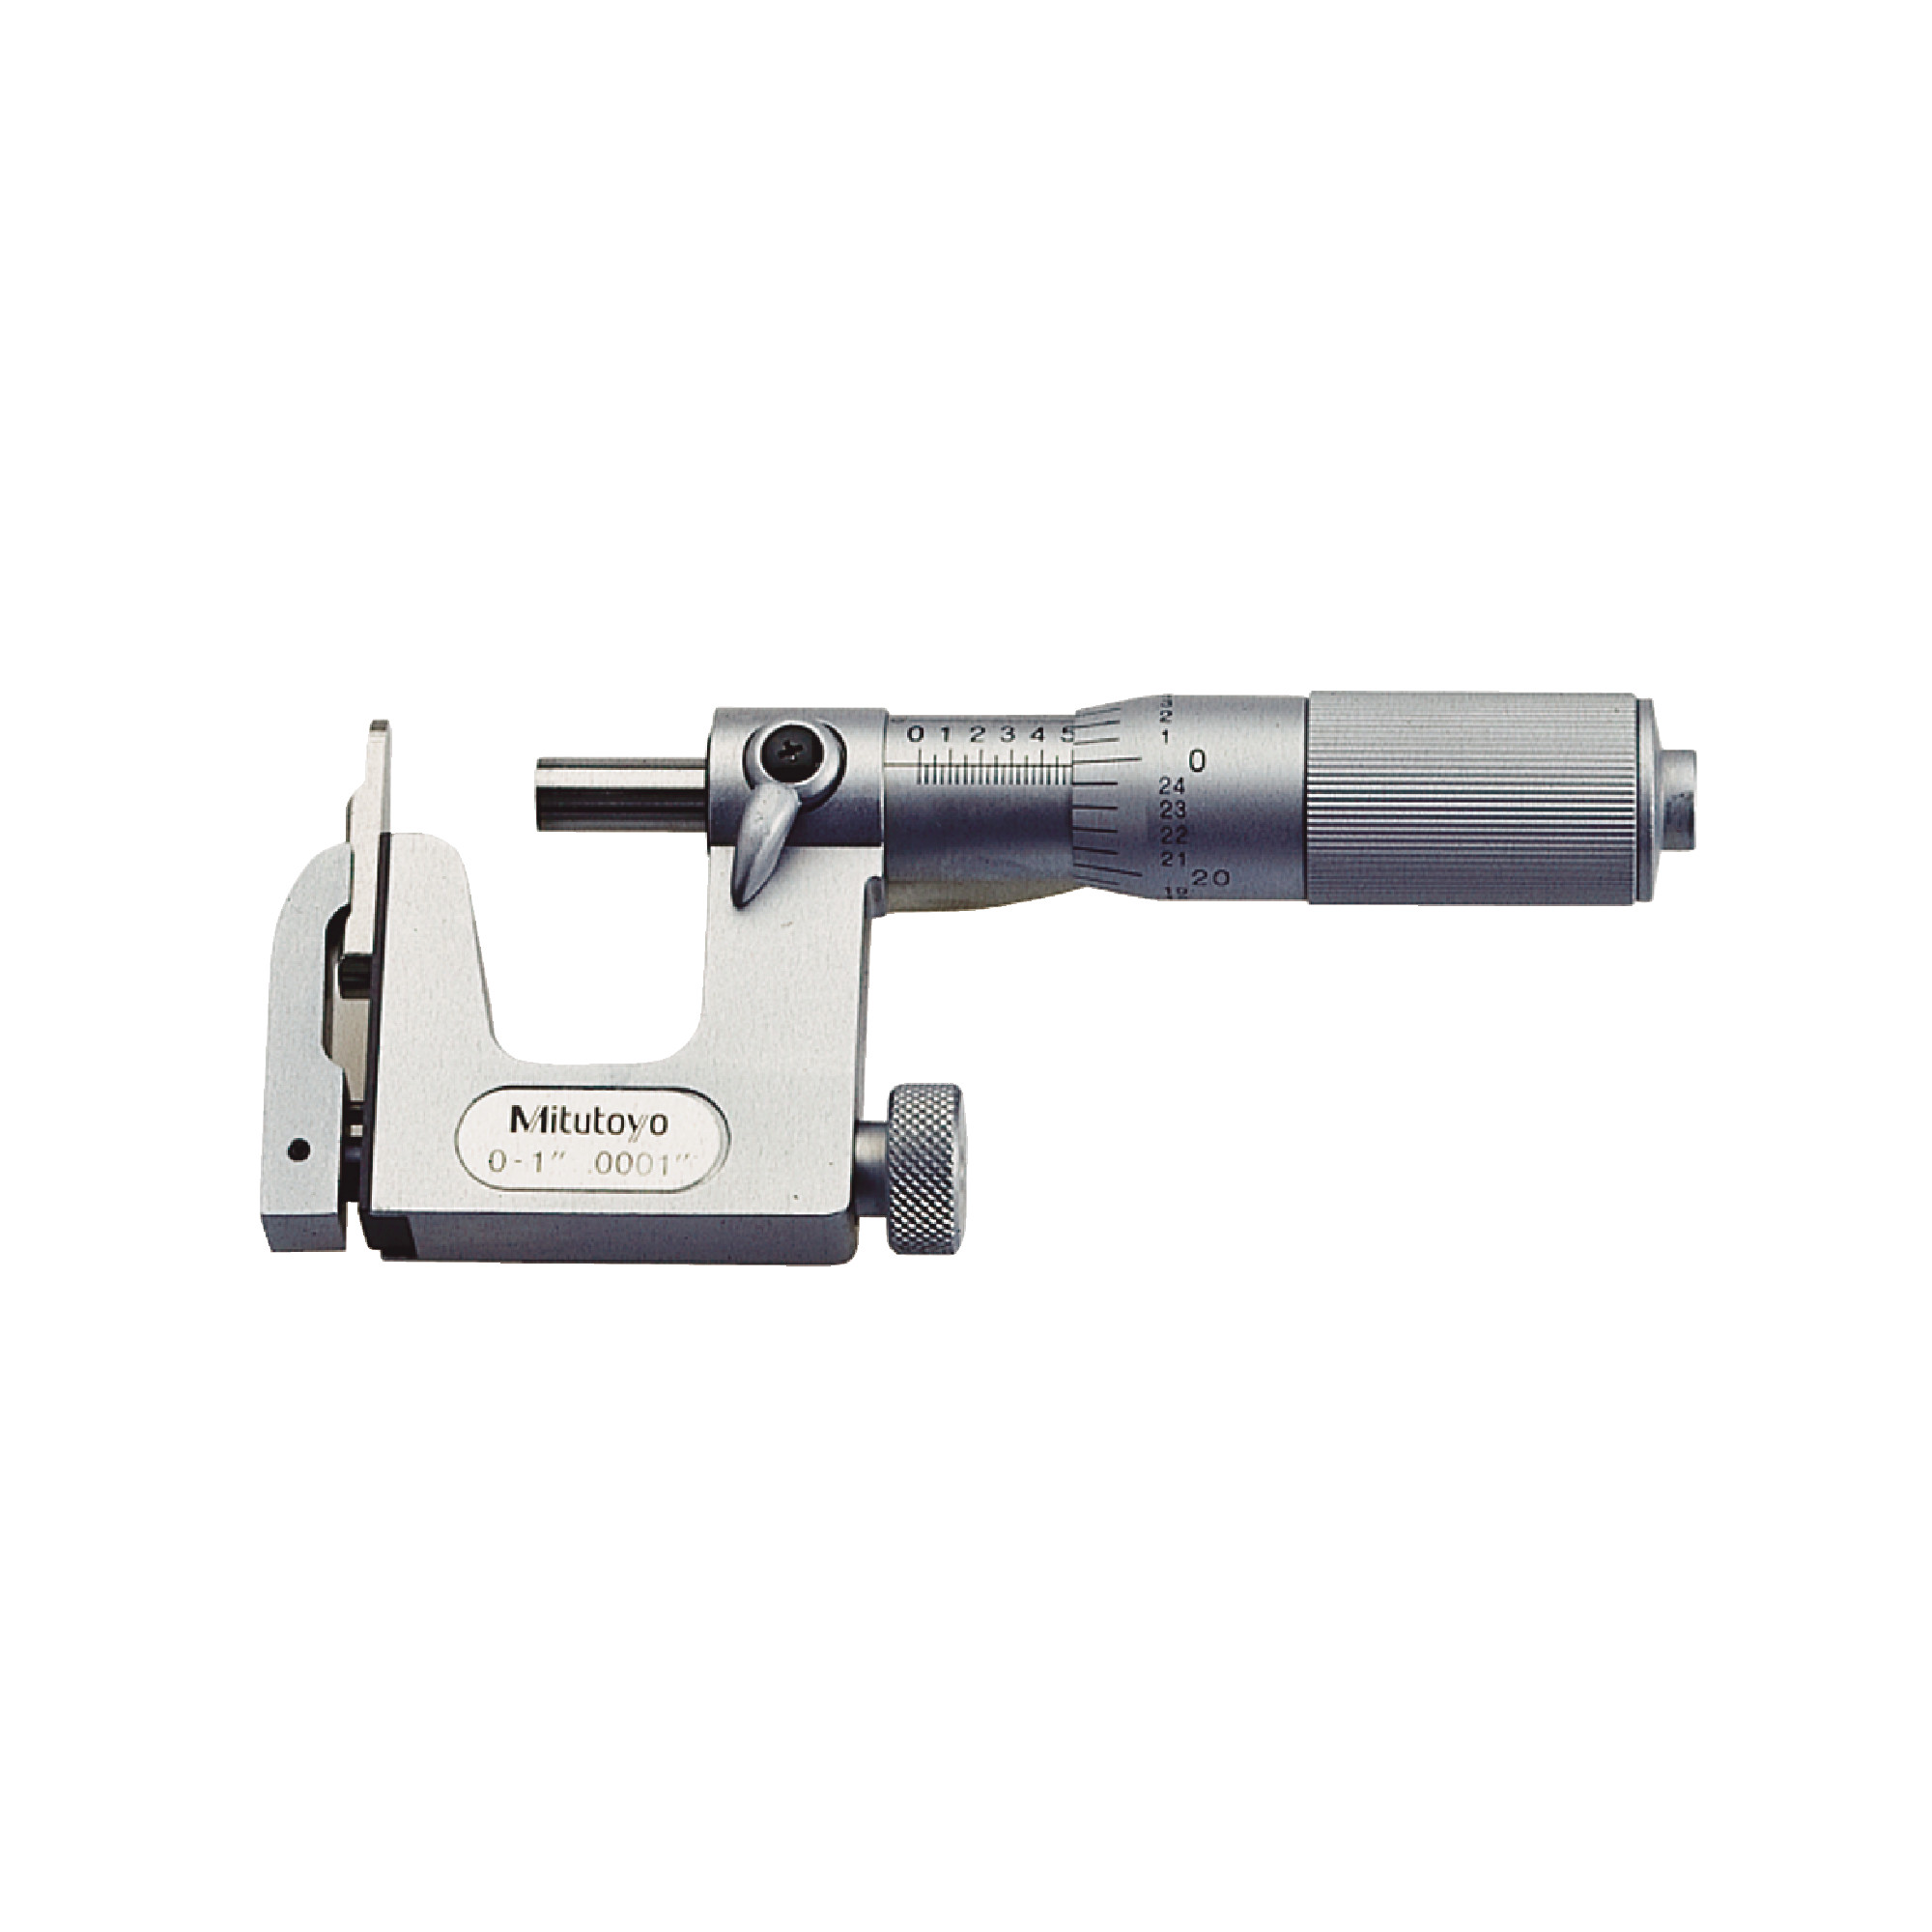 Uni-Mike Interchangeable Multi-Anvil Micrometer